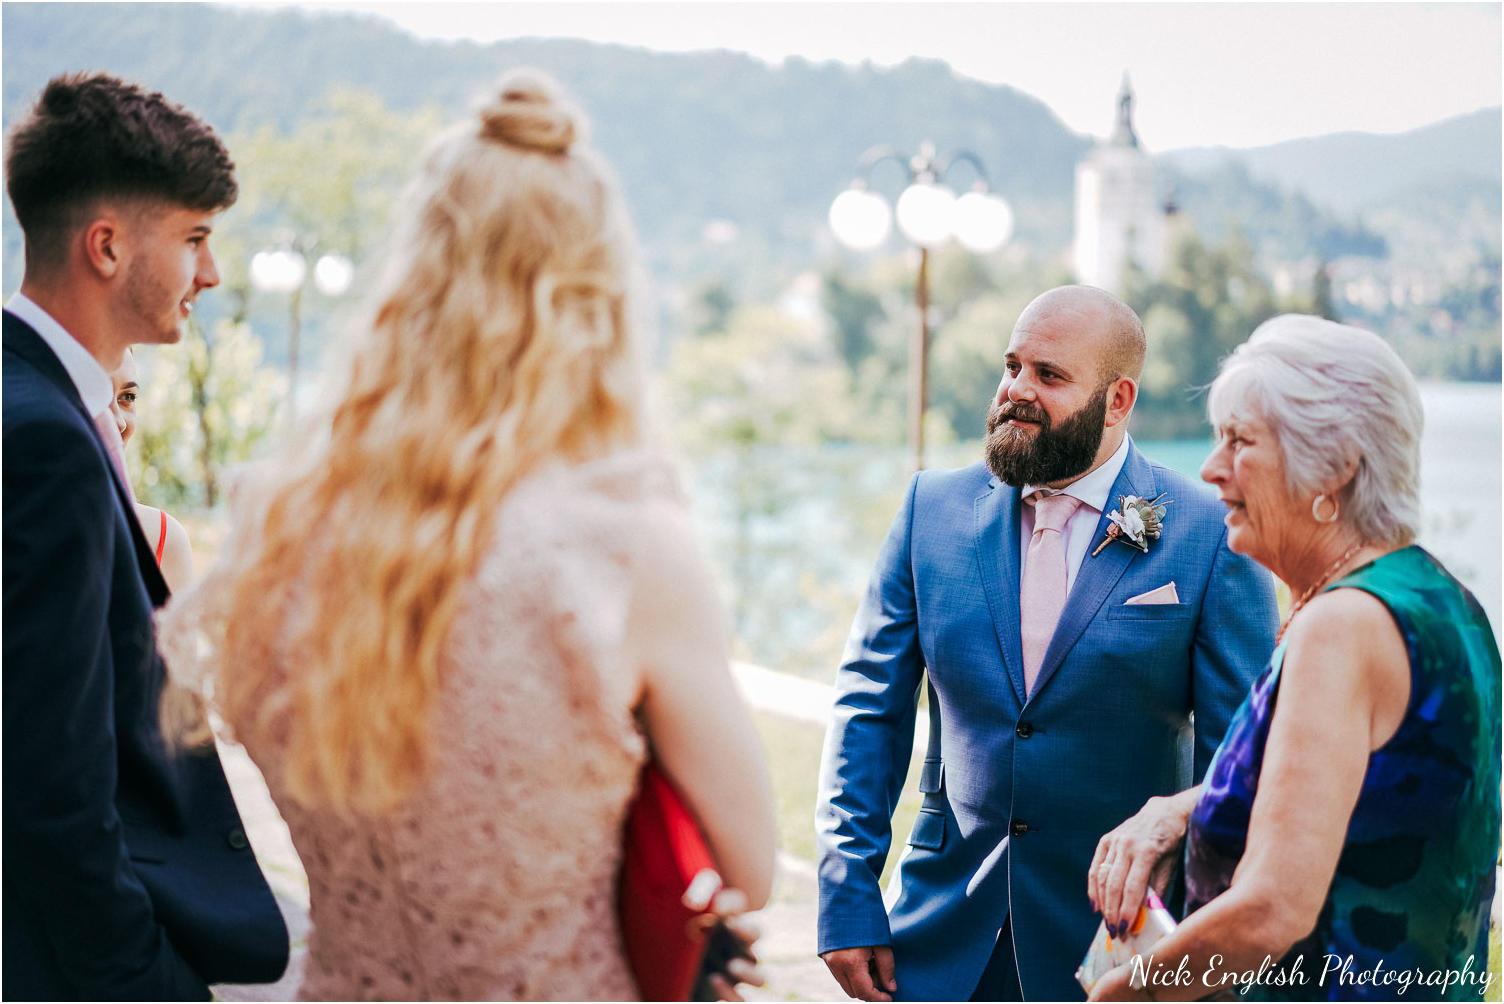 Destination_Wedding_Photographer_Slovenia_Nick_English_Photography-28.jpg